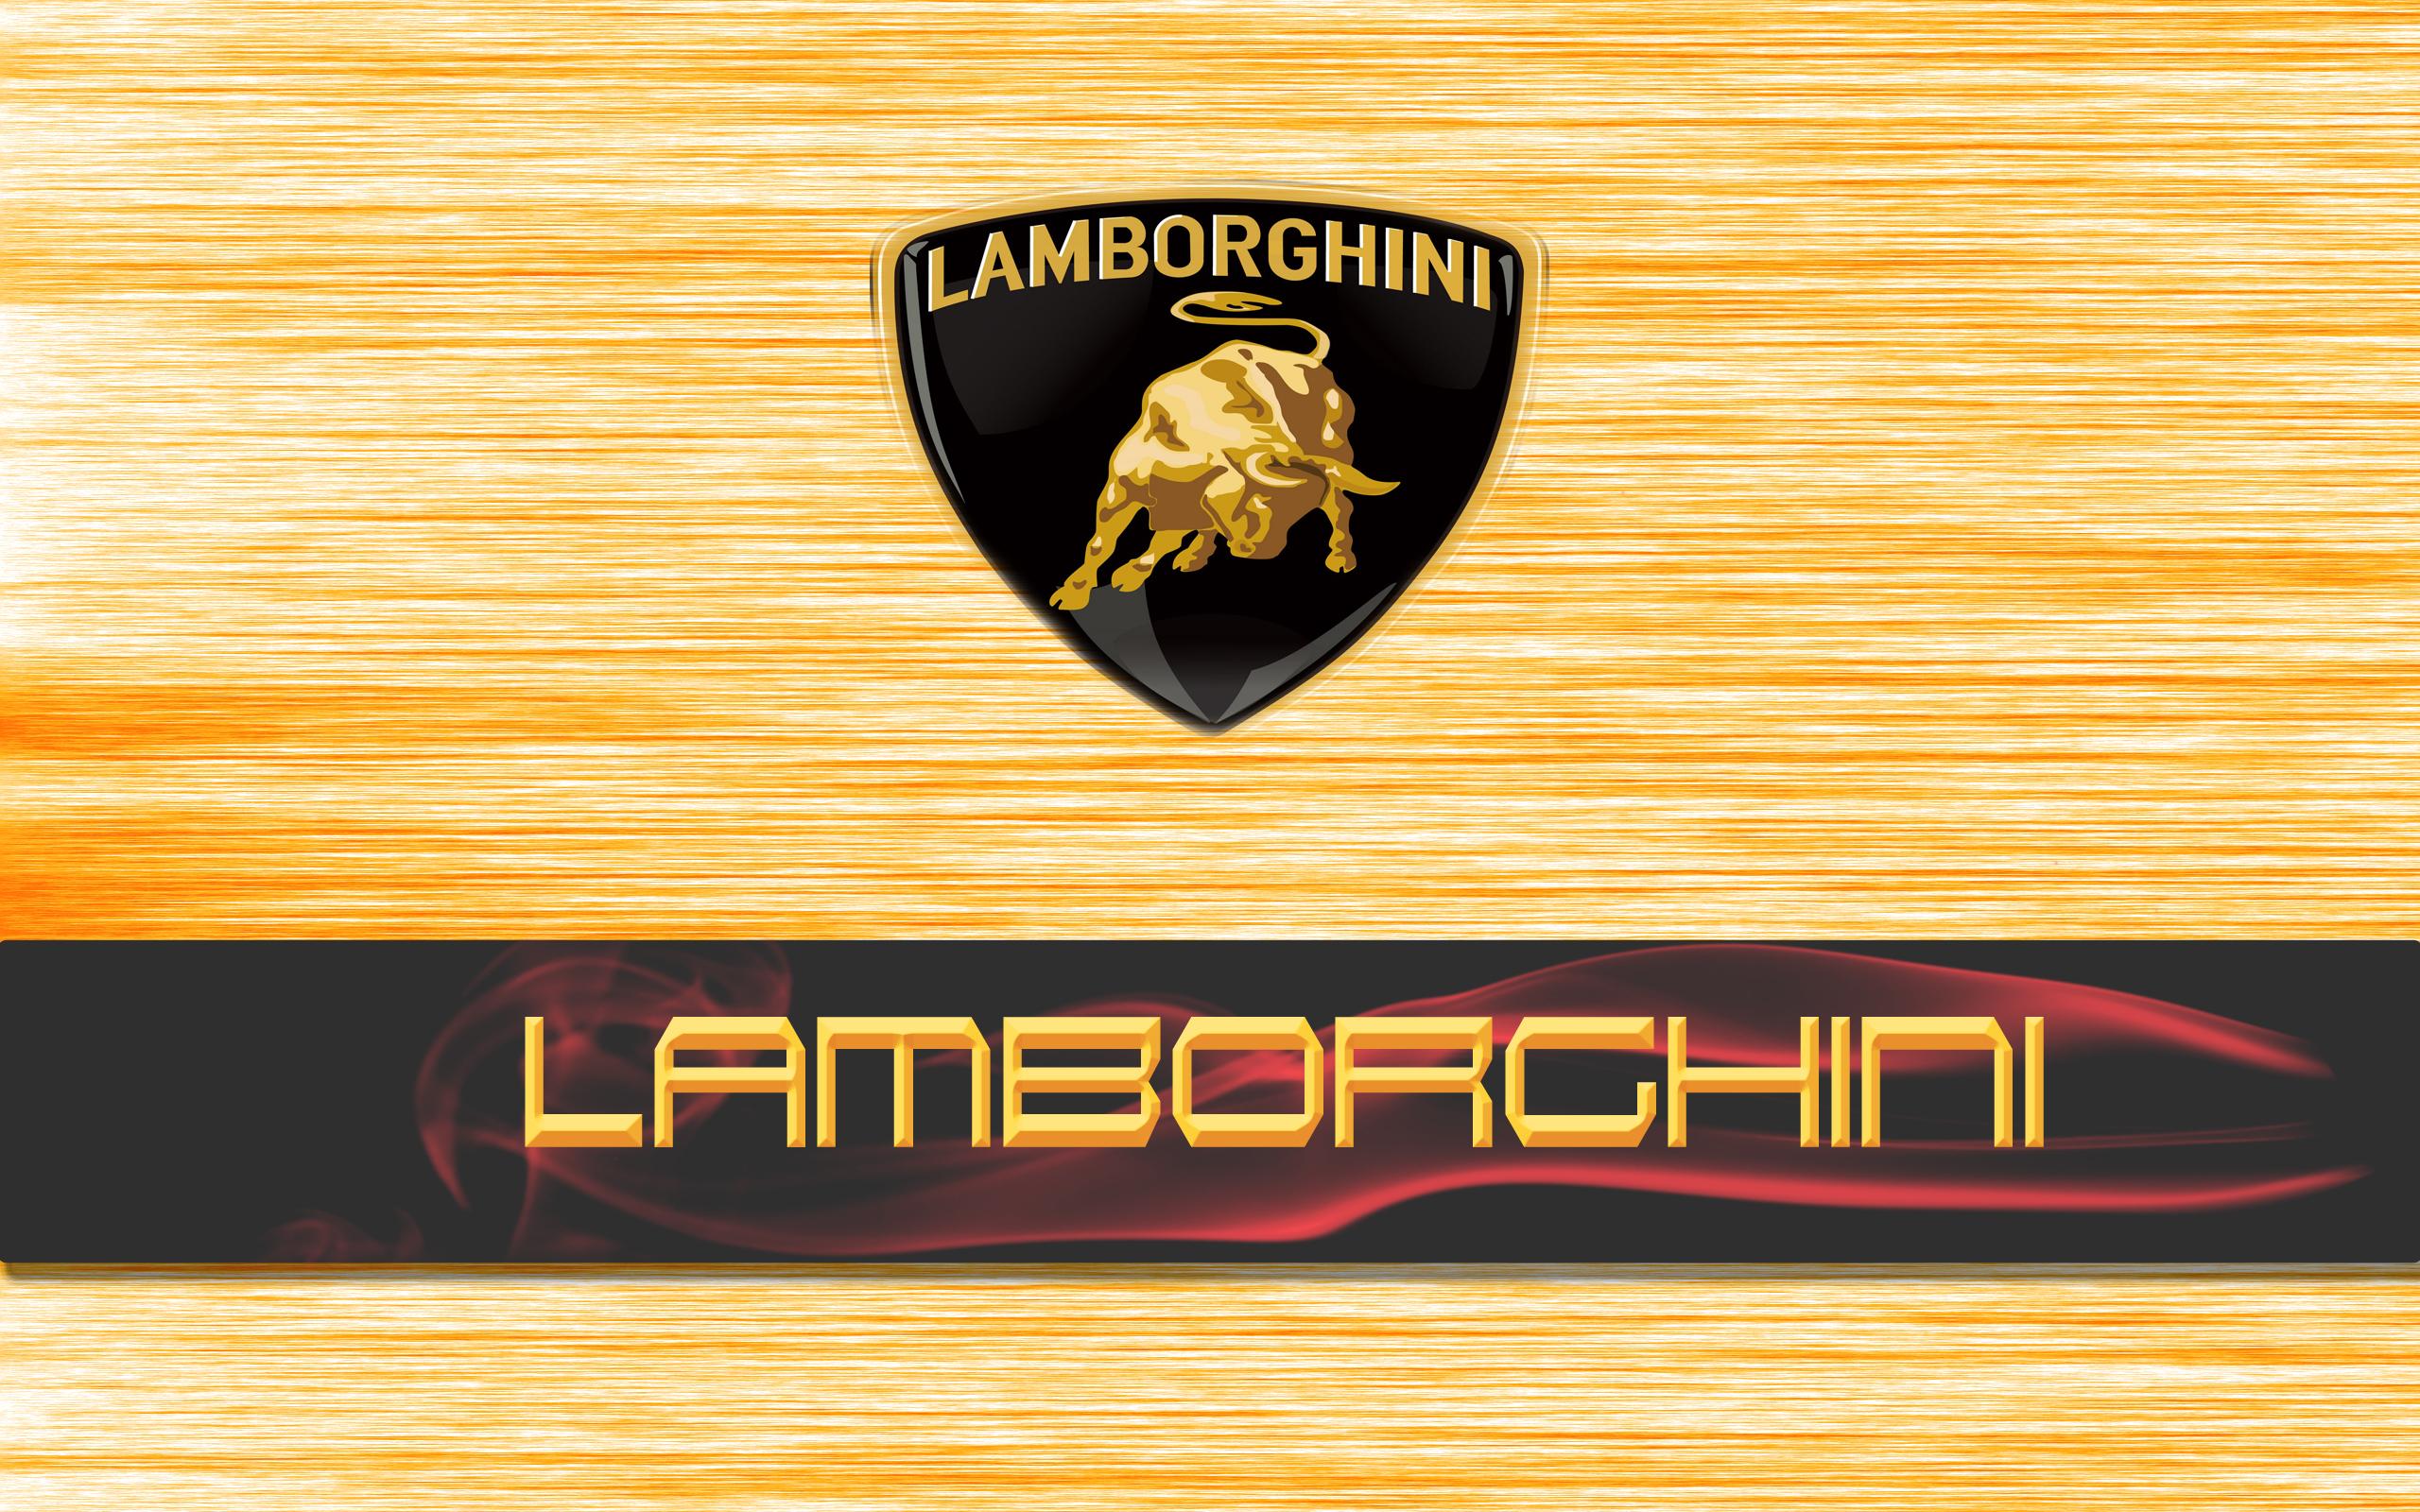 Lamborghini Logo Wallpaper Hd Wallpapersafari